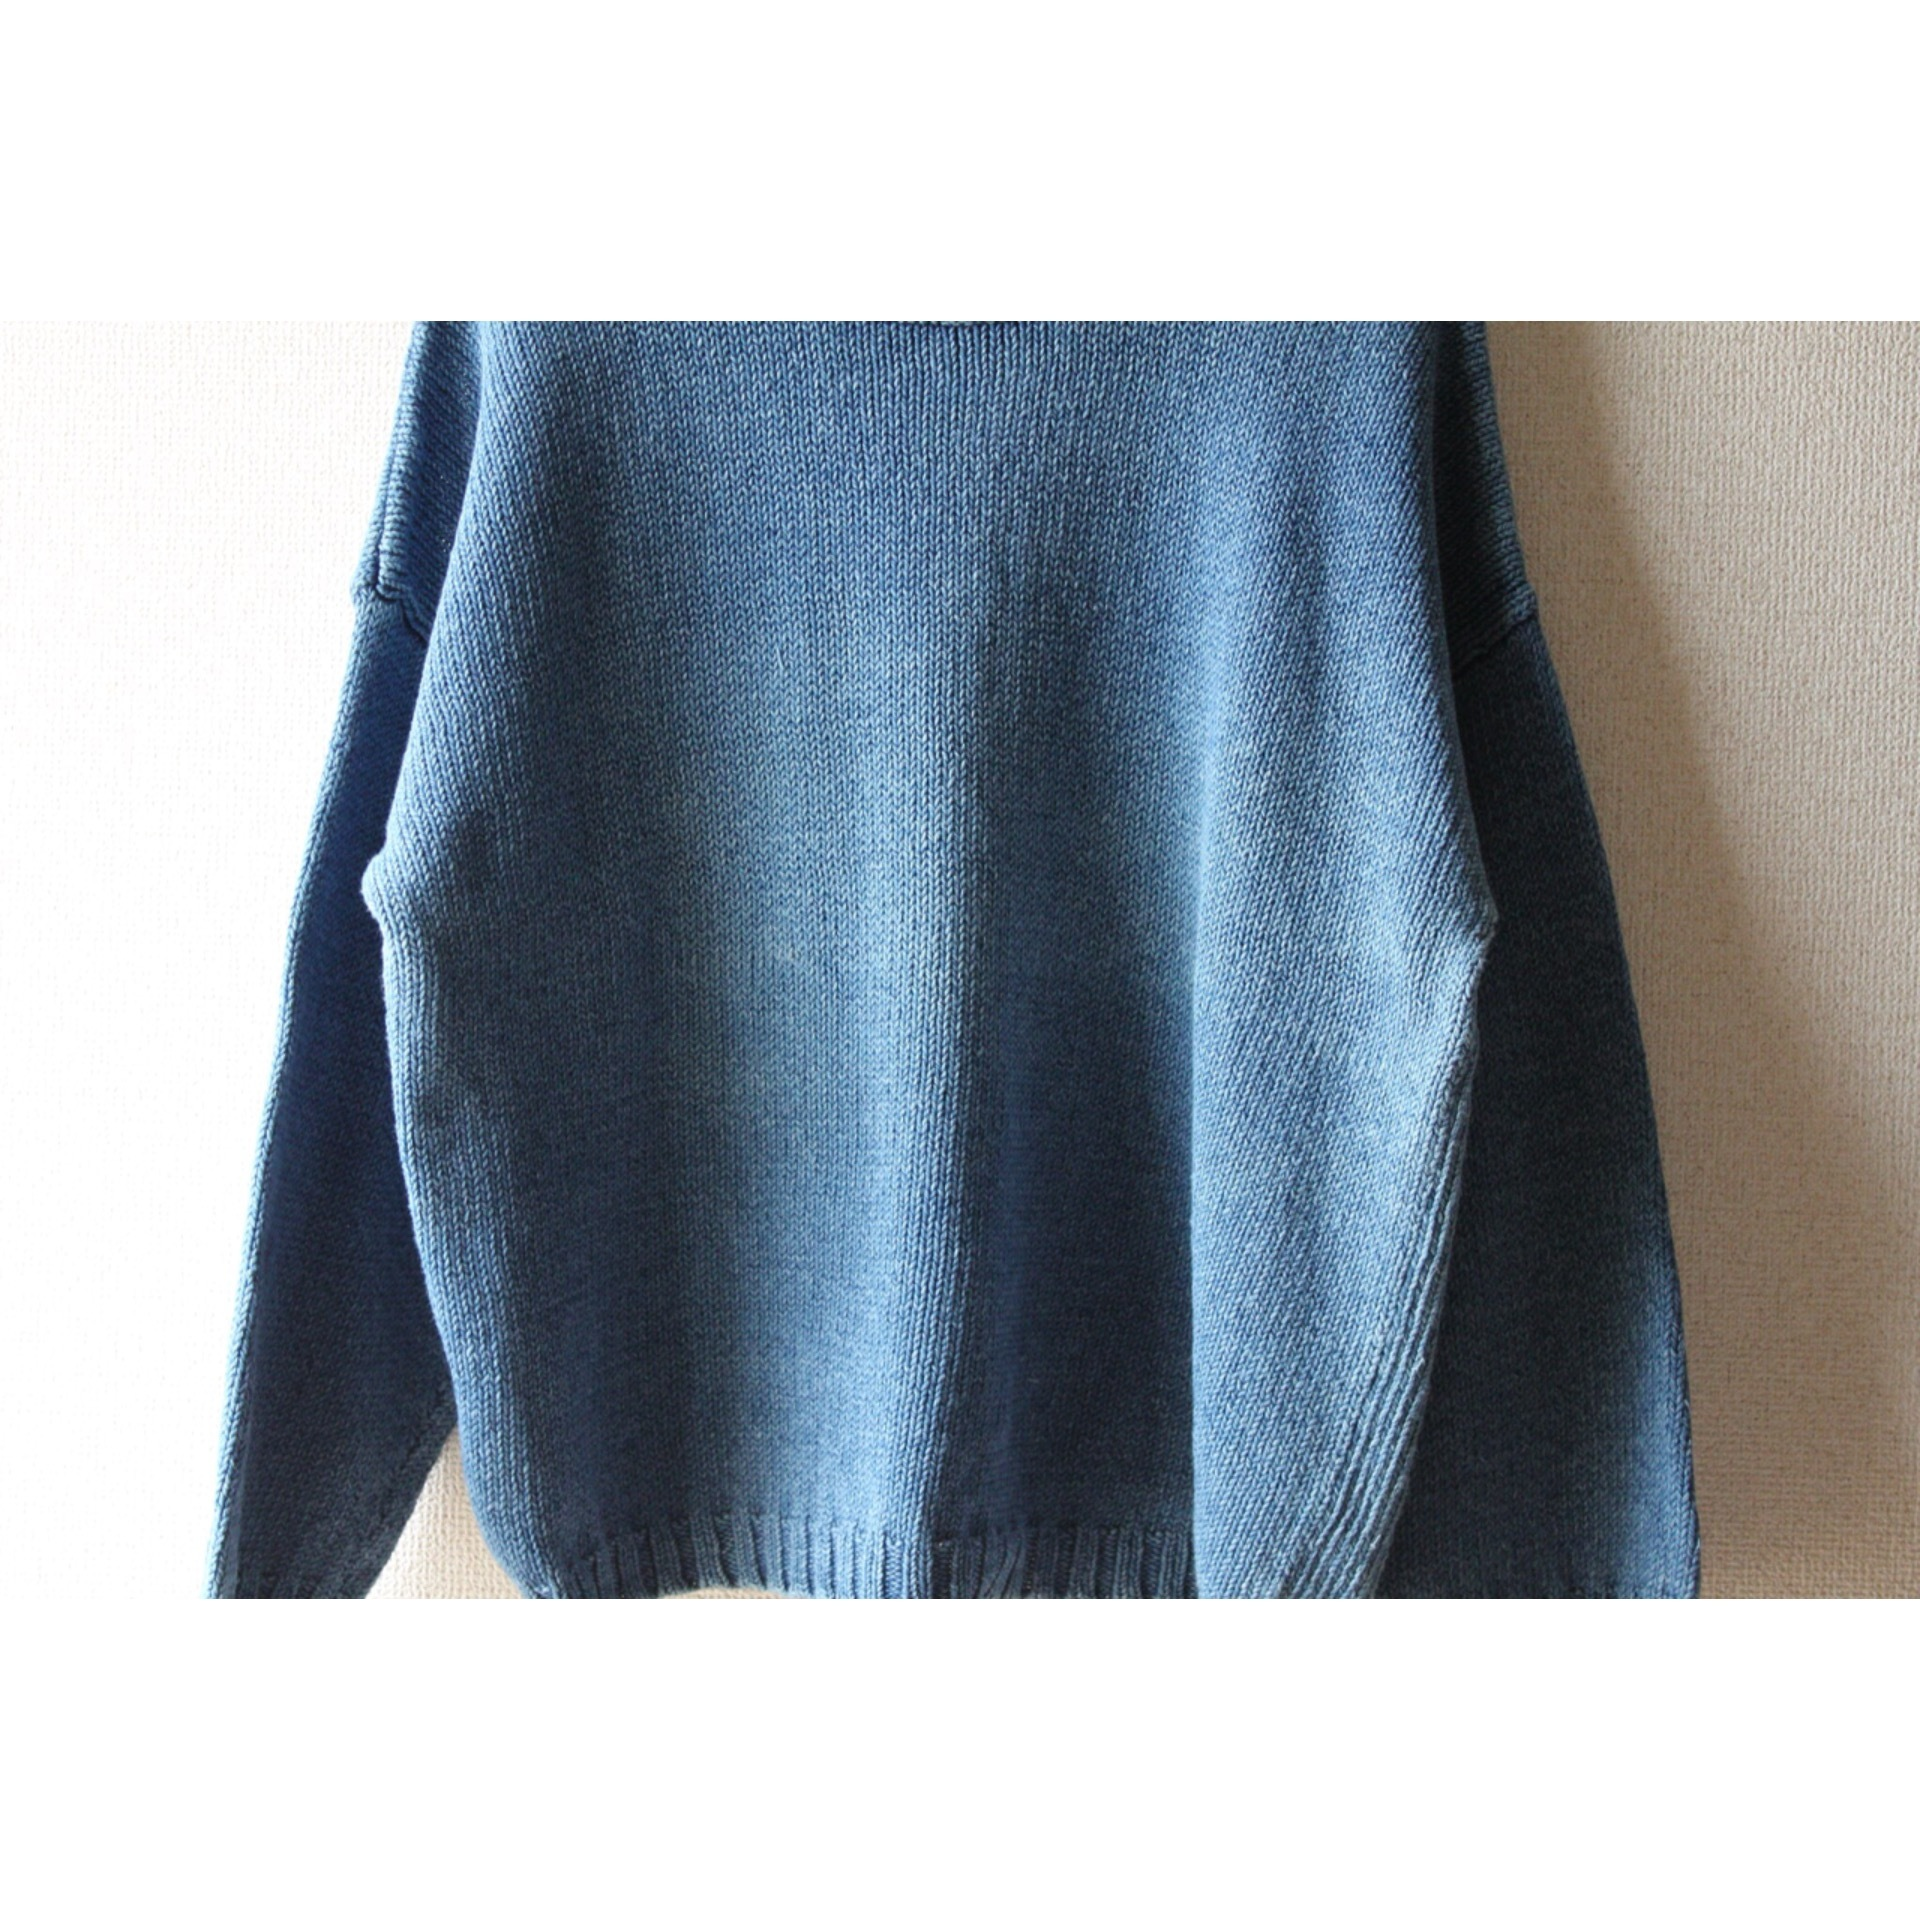 Vintage indigo sweater